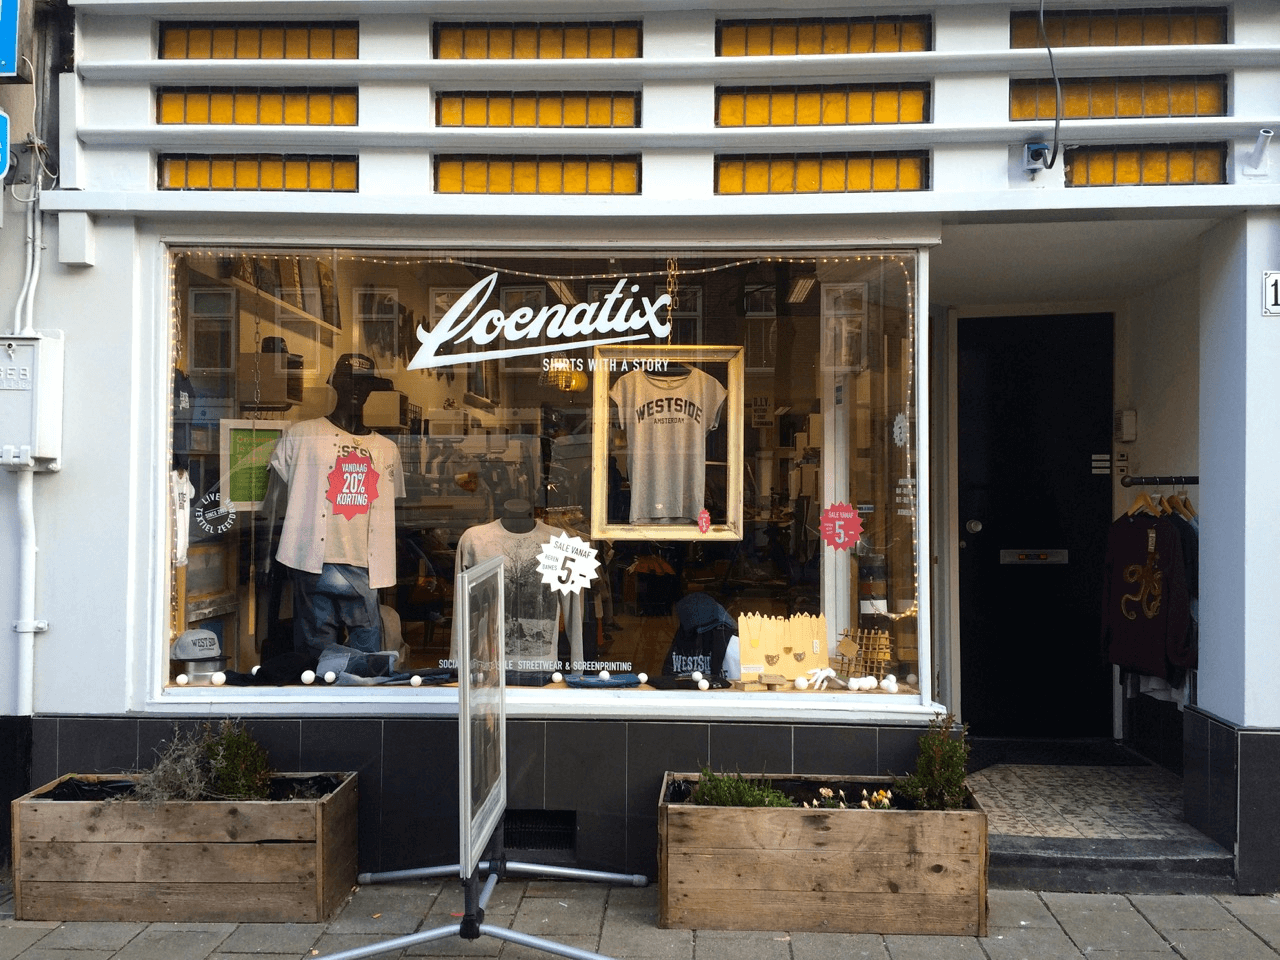 Loenatix